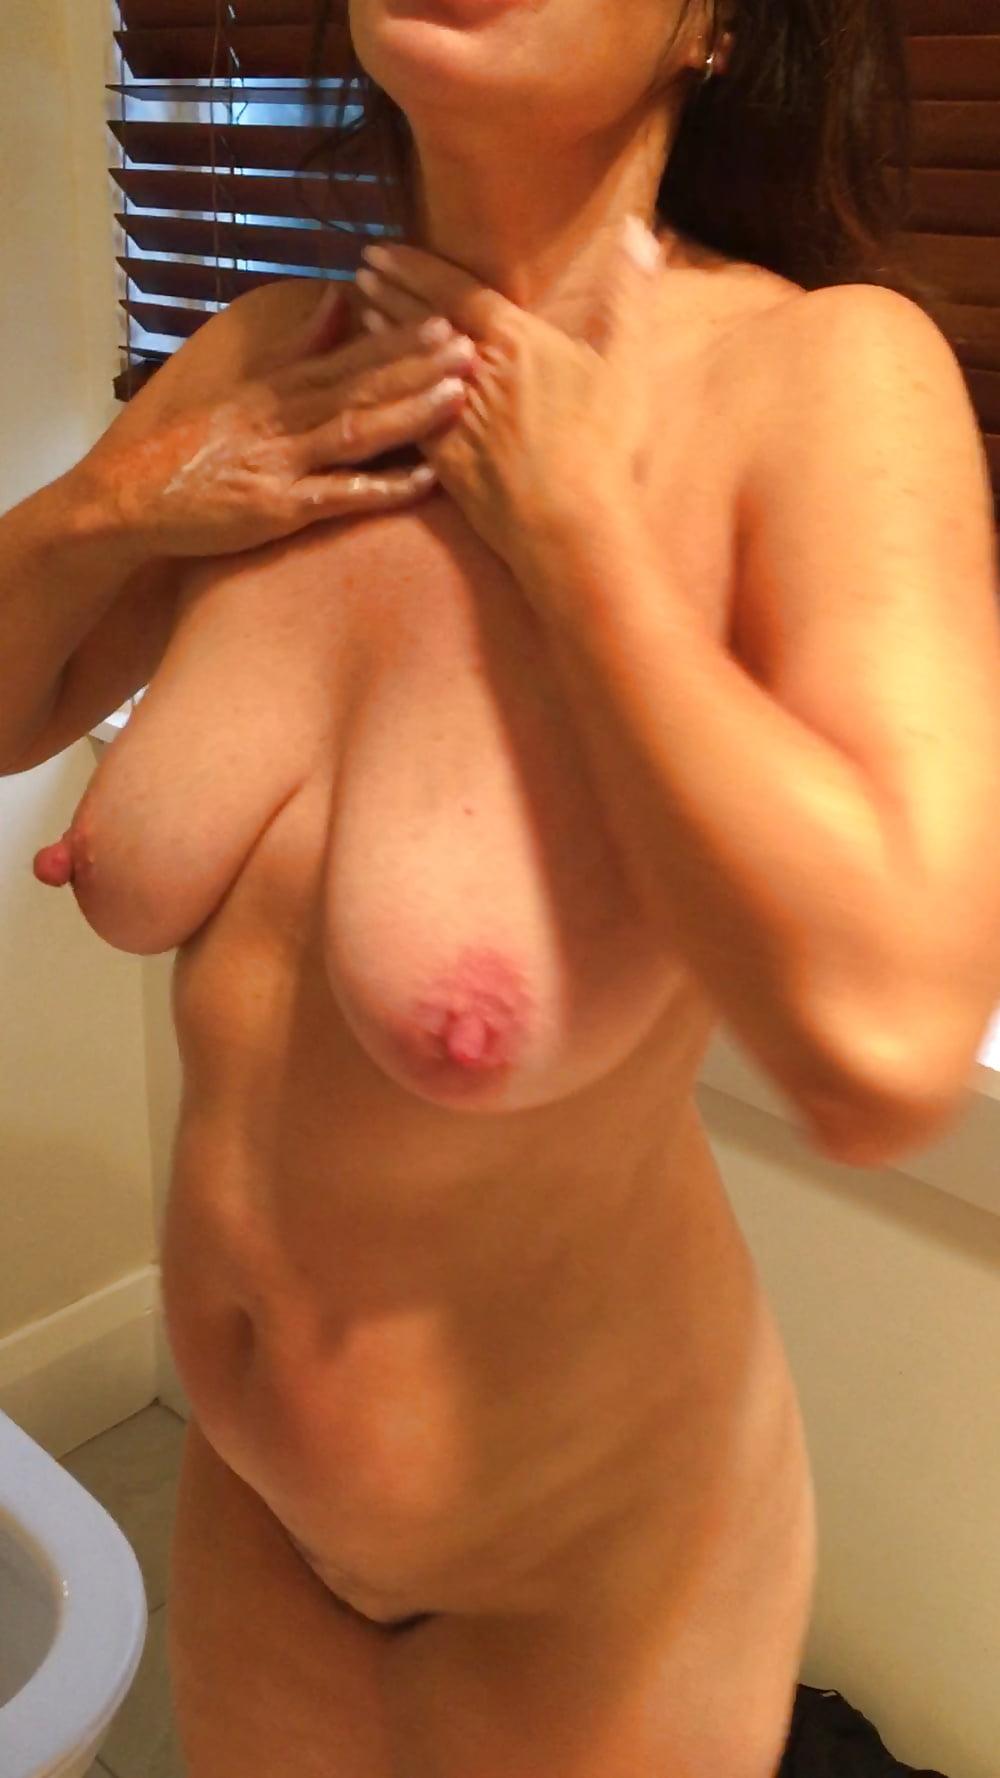 her xxxtra long nipples